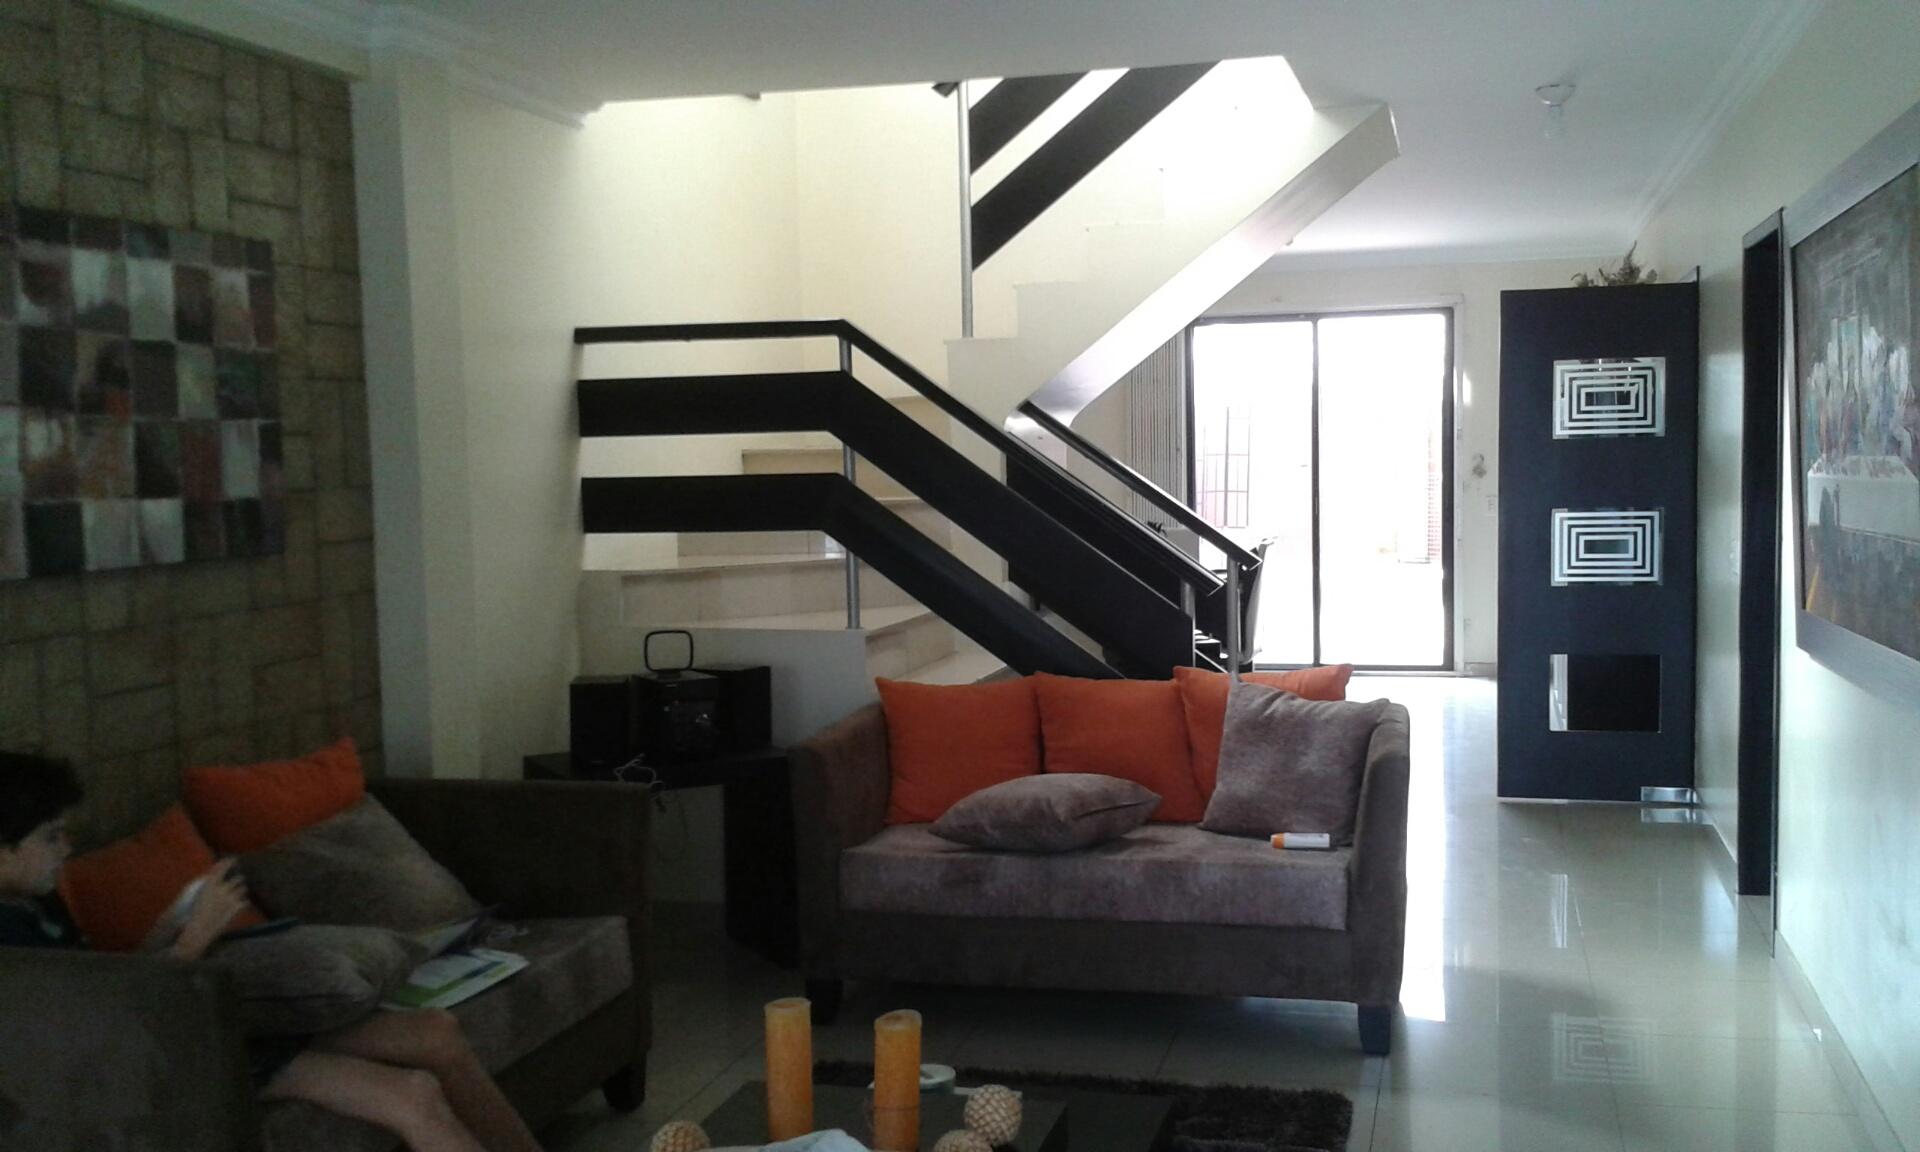 casa de venta Ciudad Celeste Samborondon